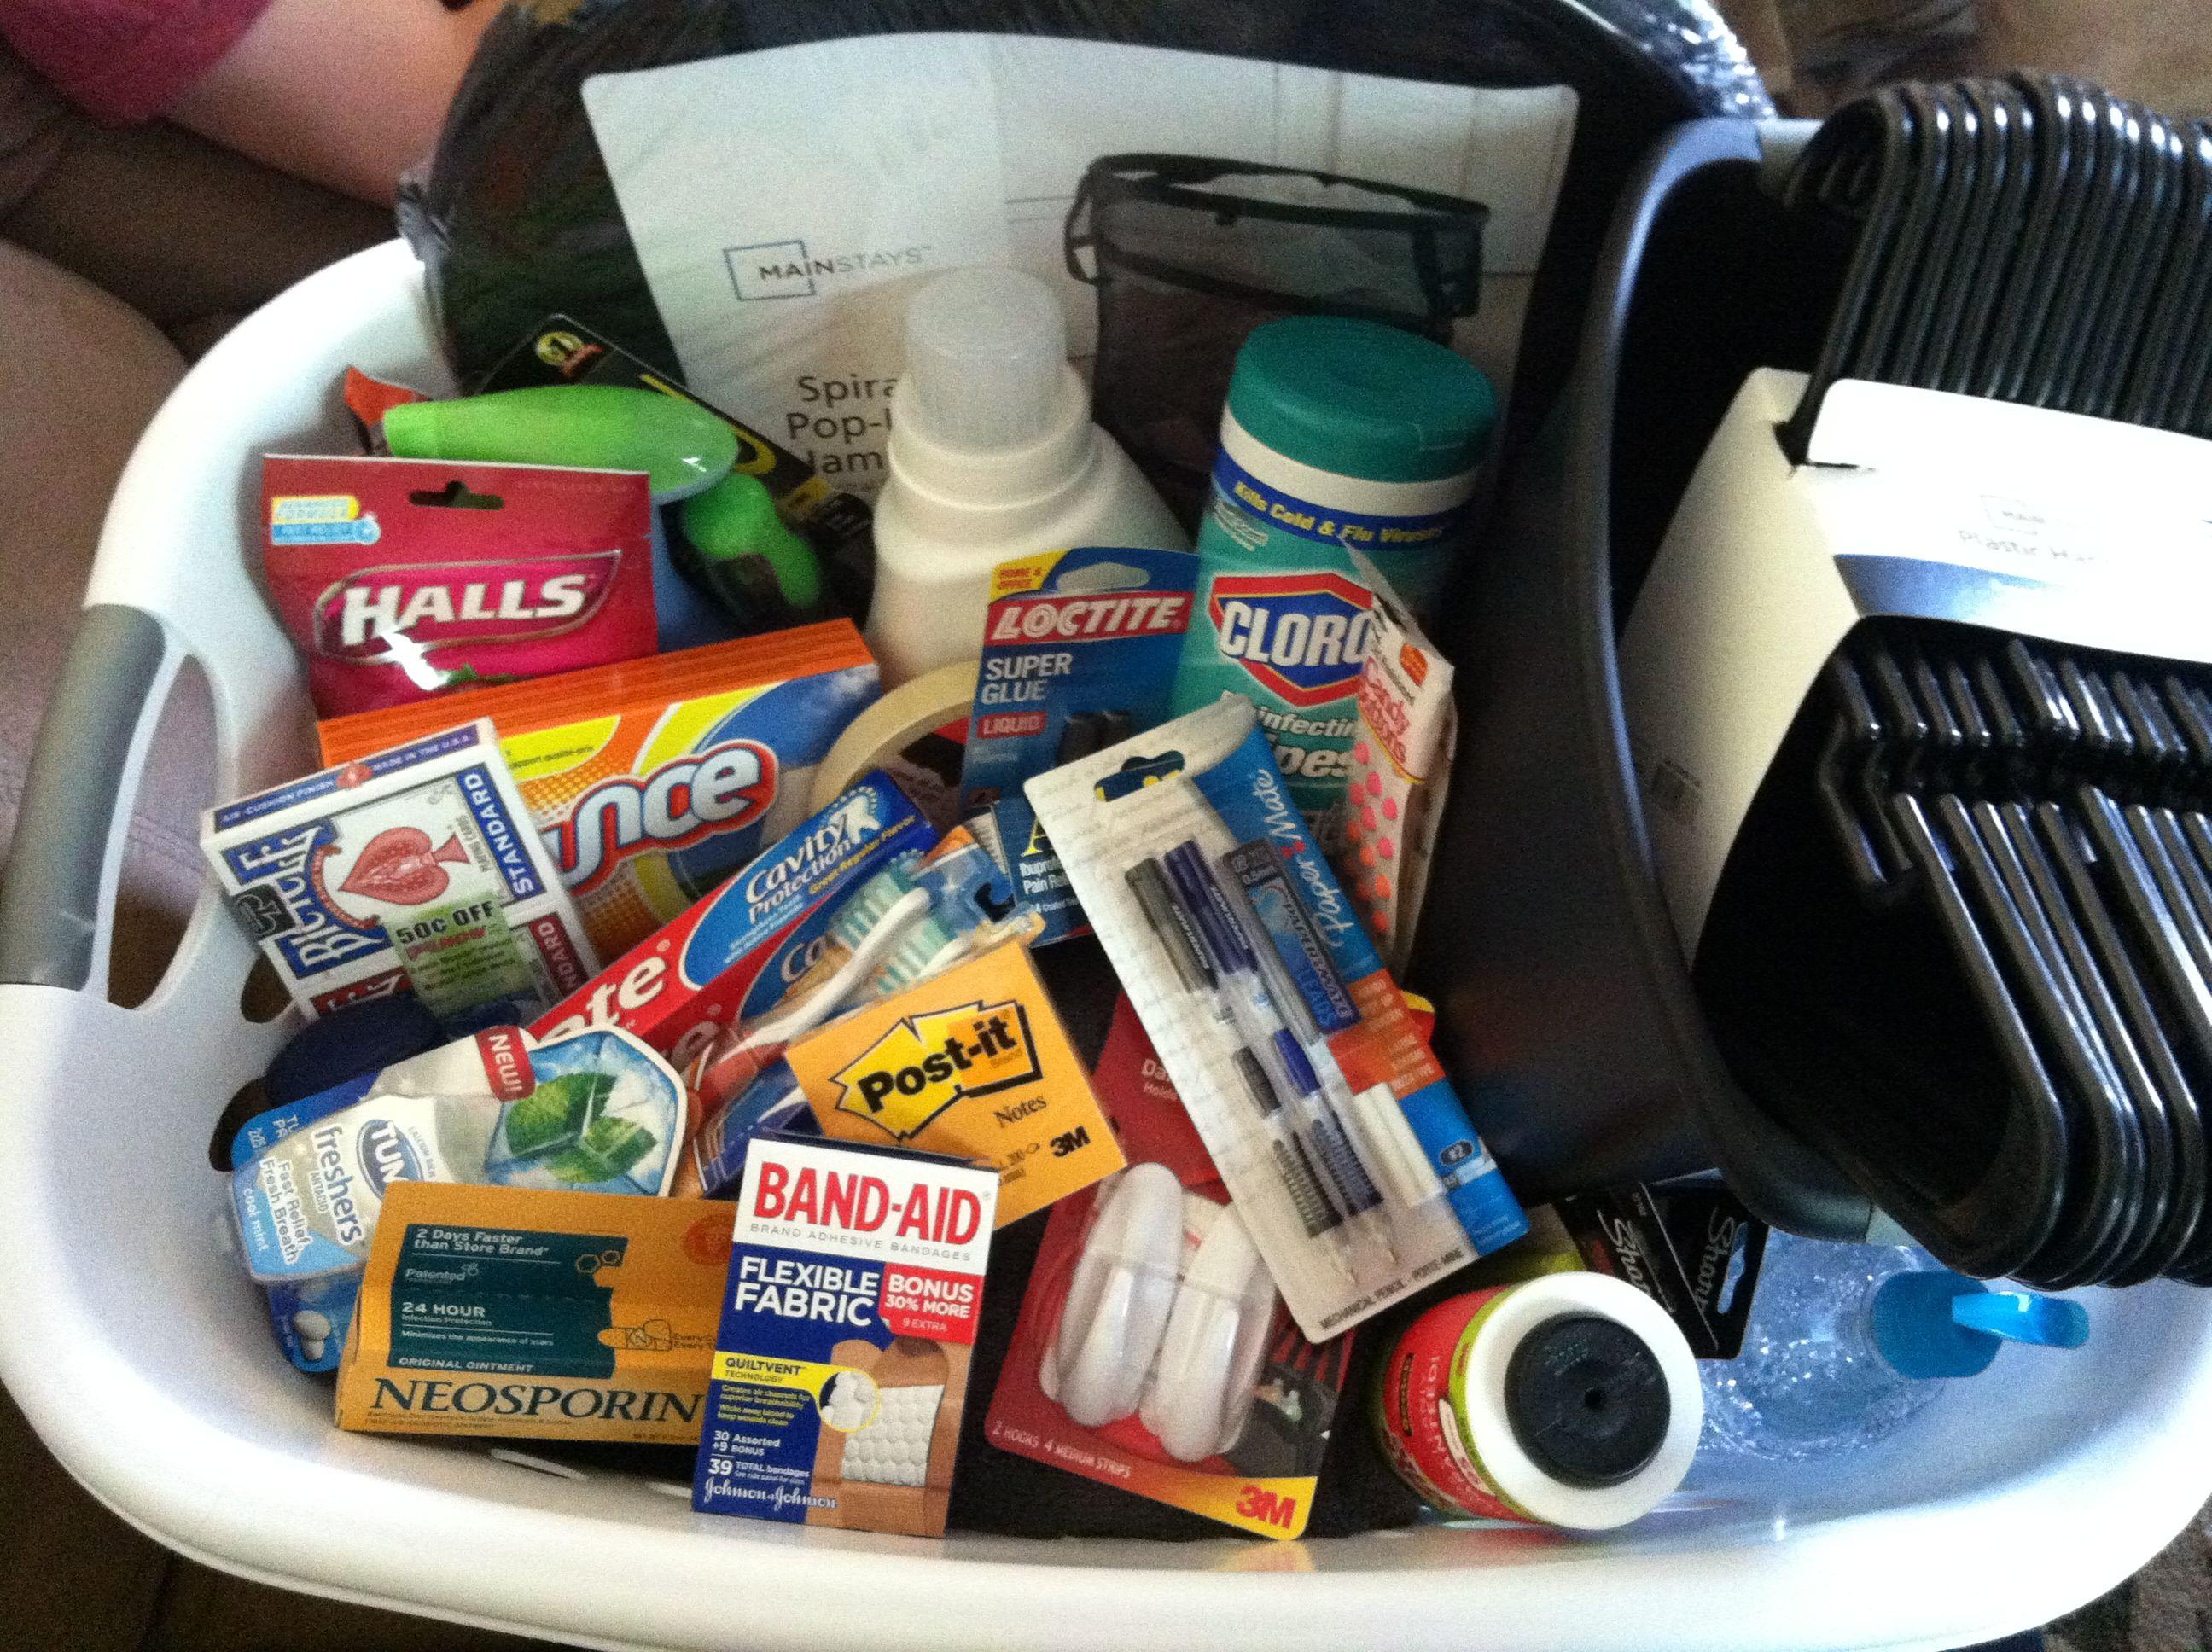 High School Graduation Gift Dorm Room Essentials Laundry